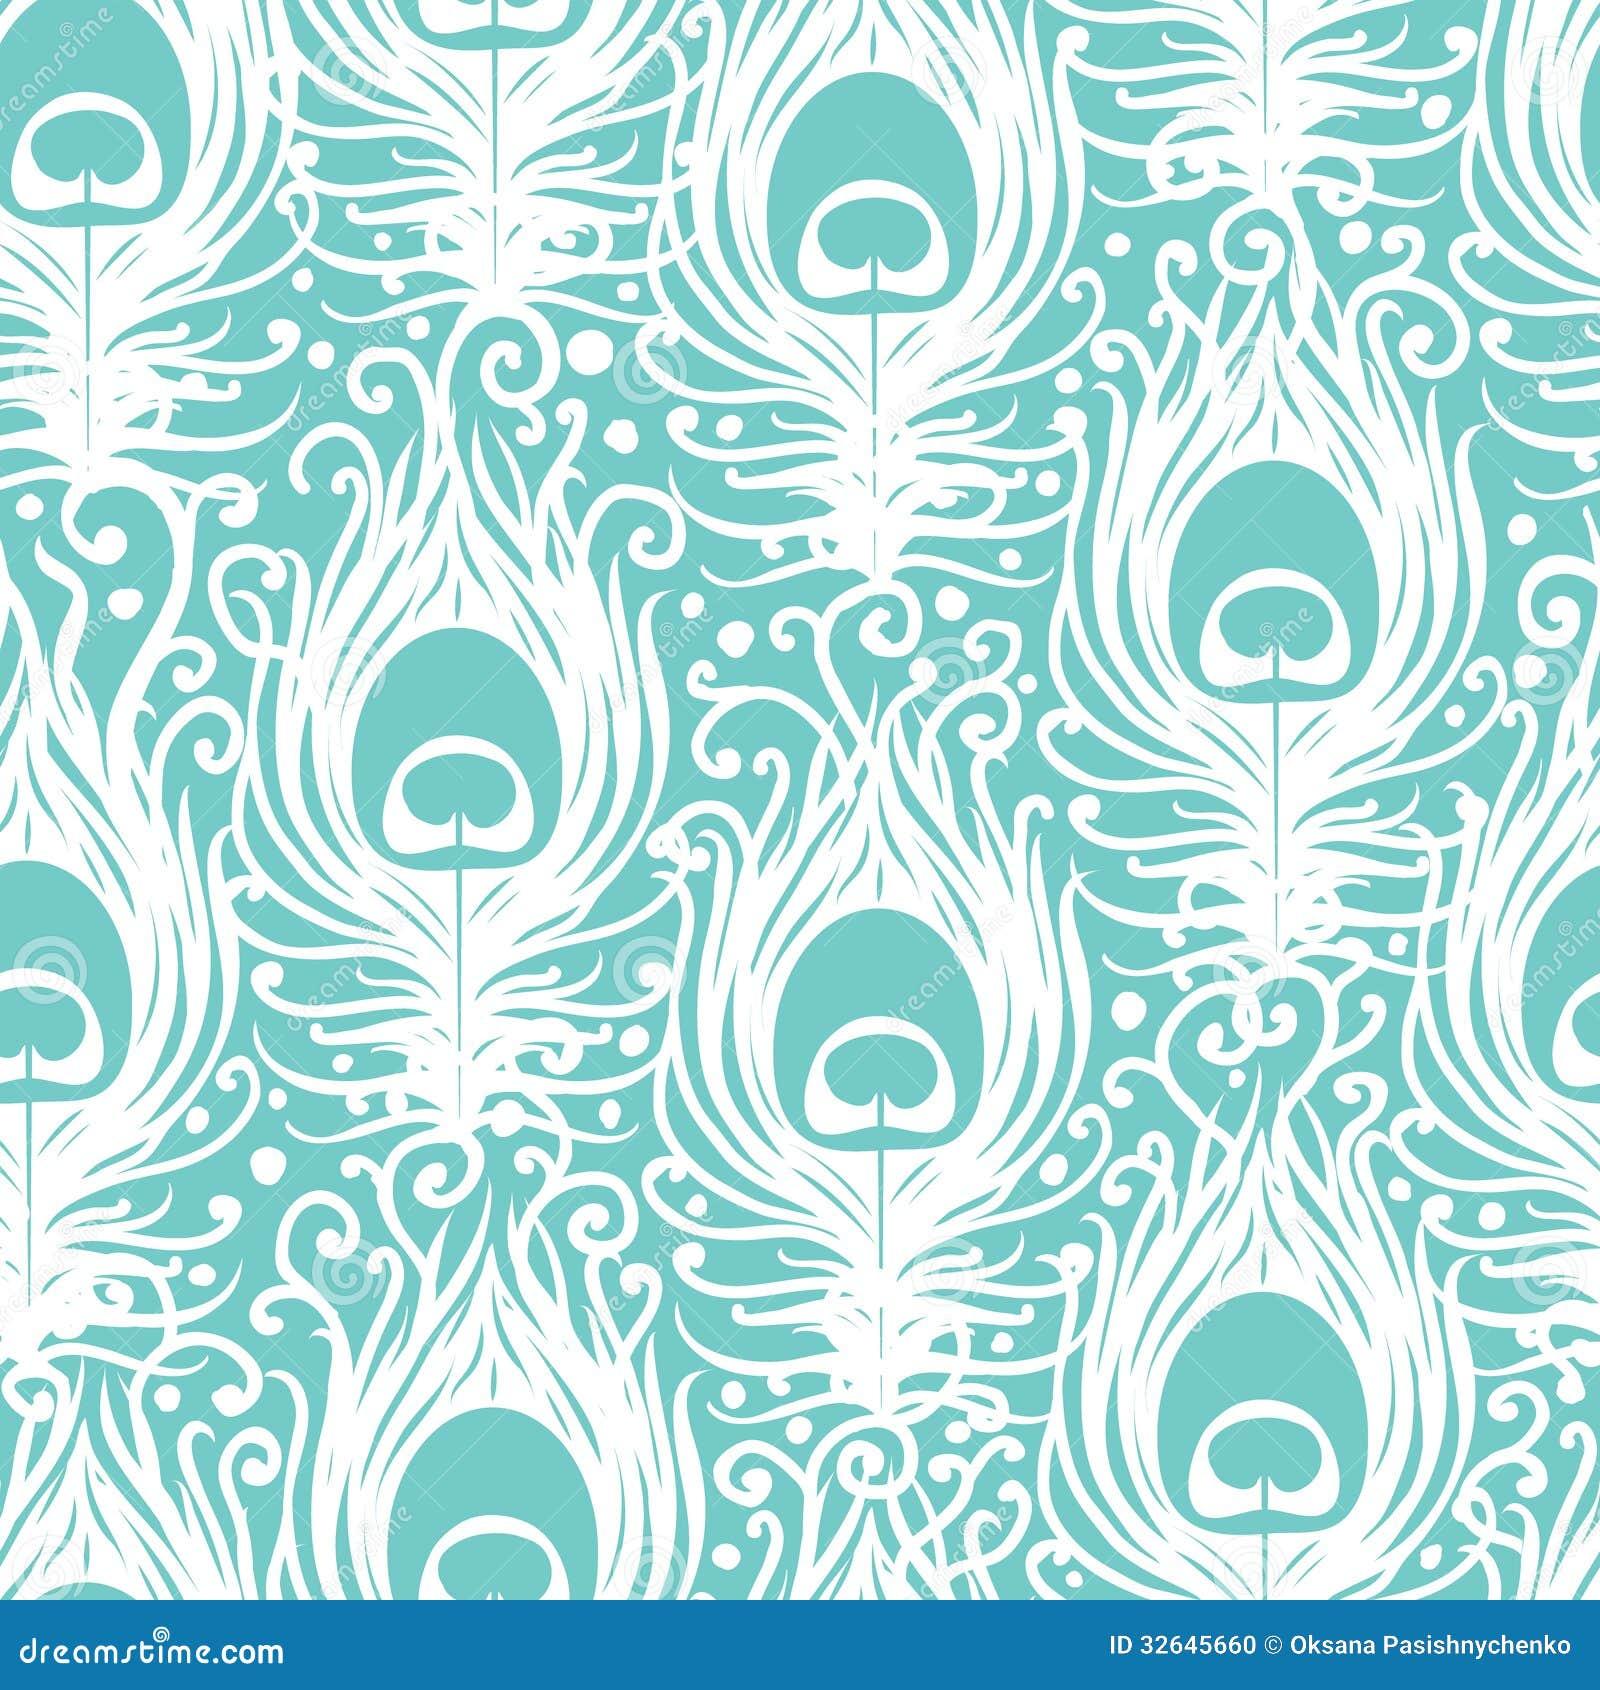 photo collage mac 10 5 8 gmLag